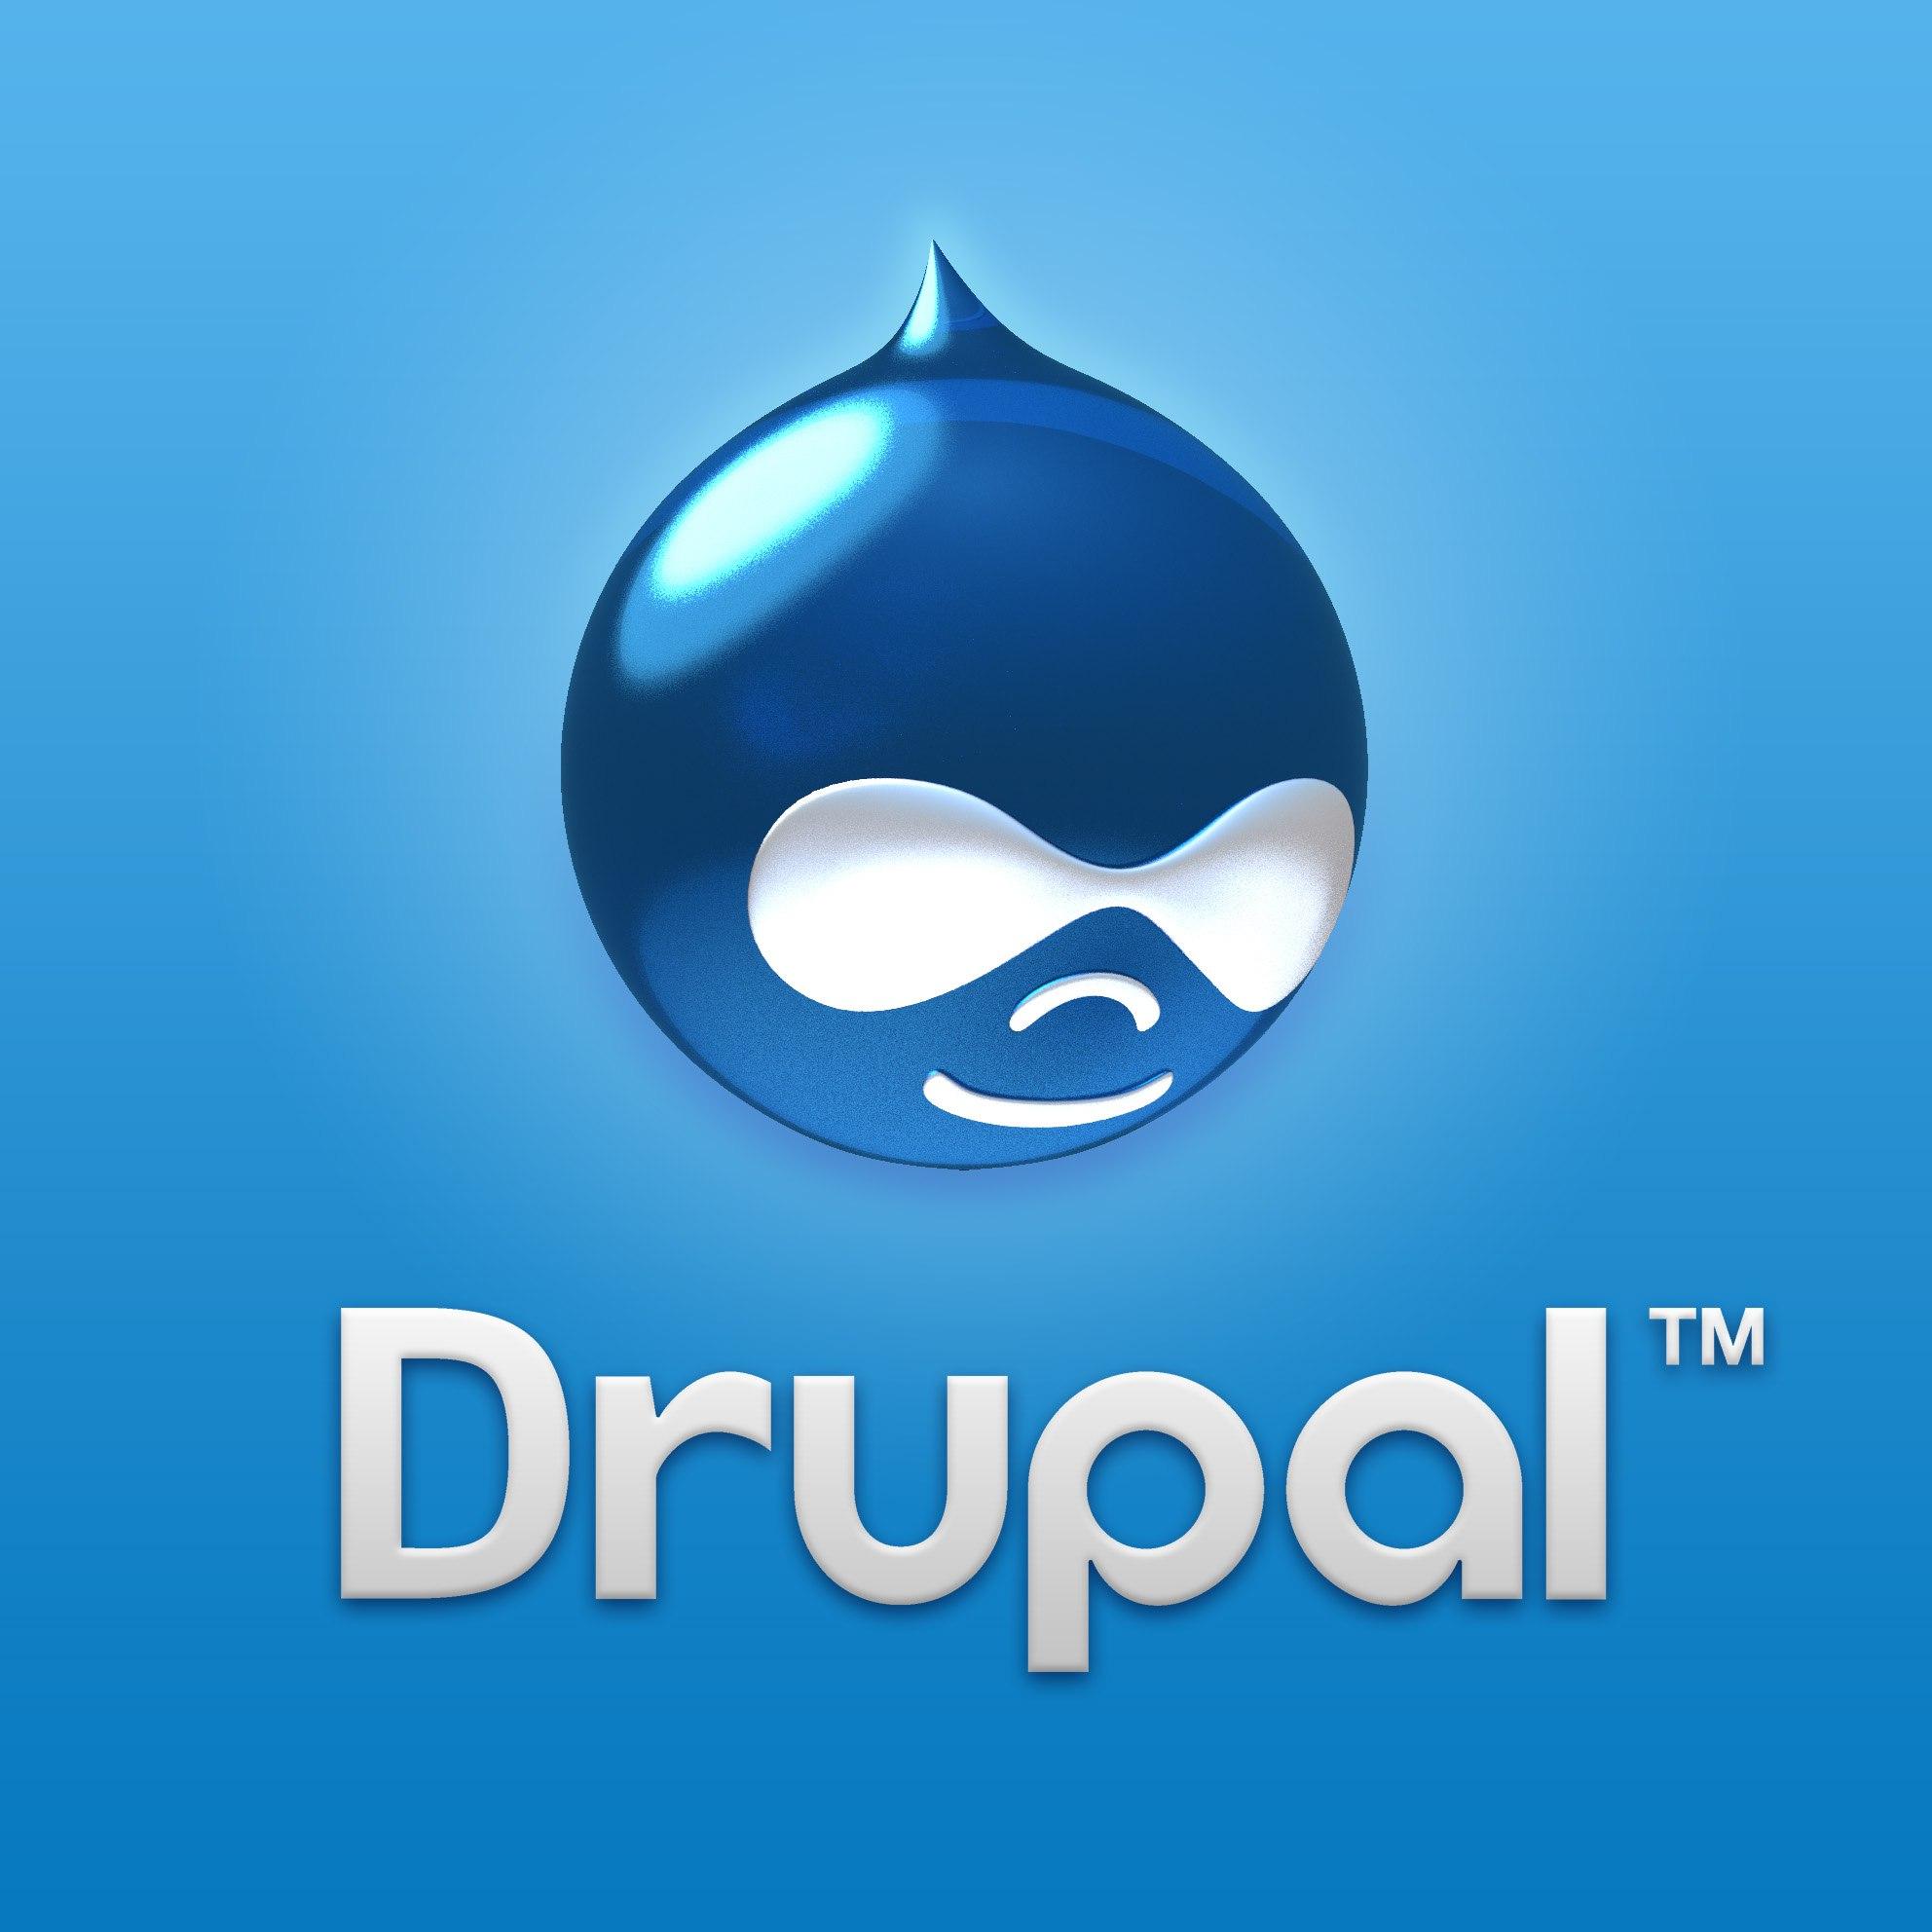 картинка: значок Drupal